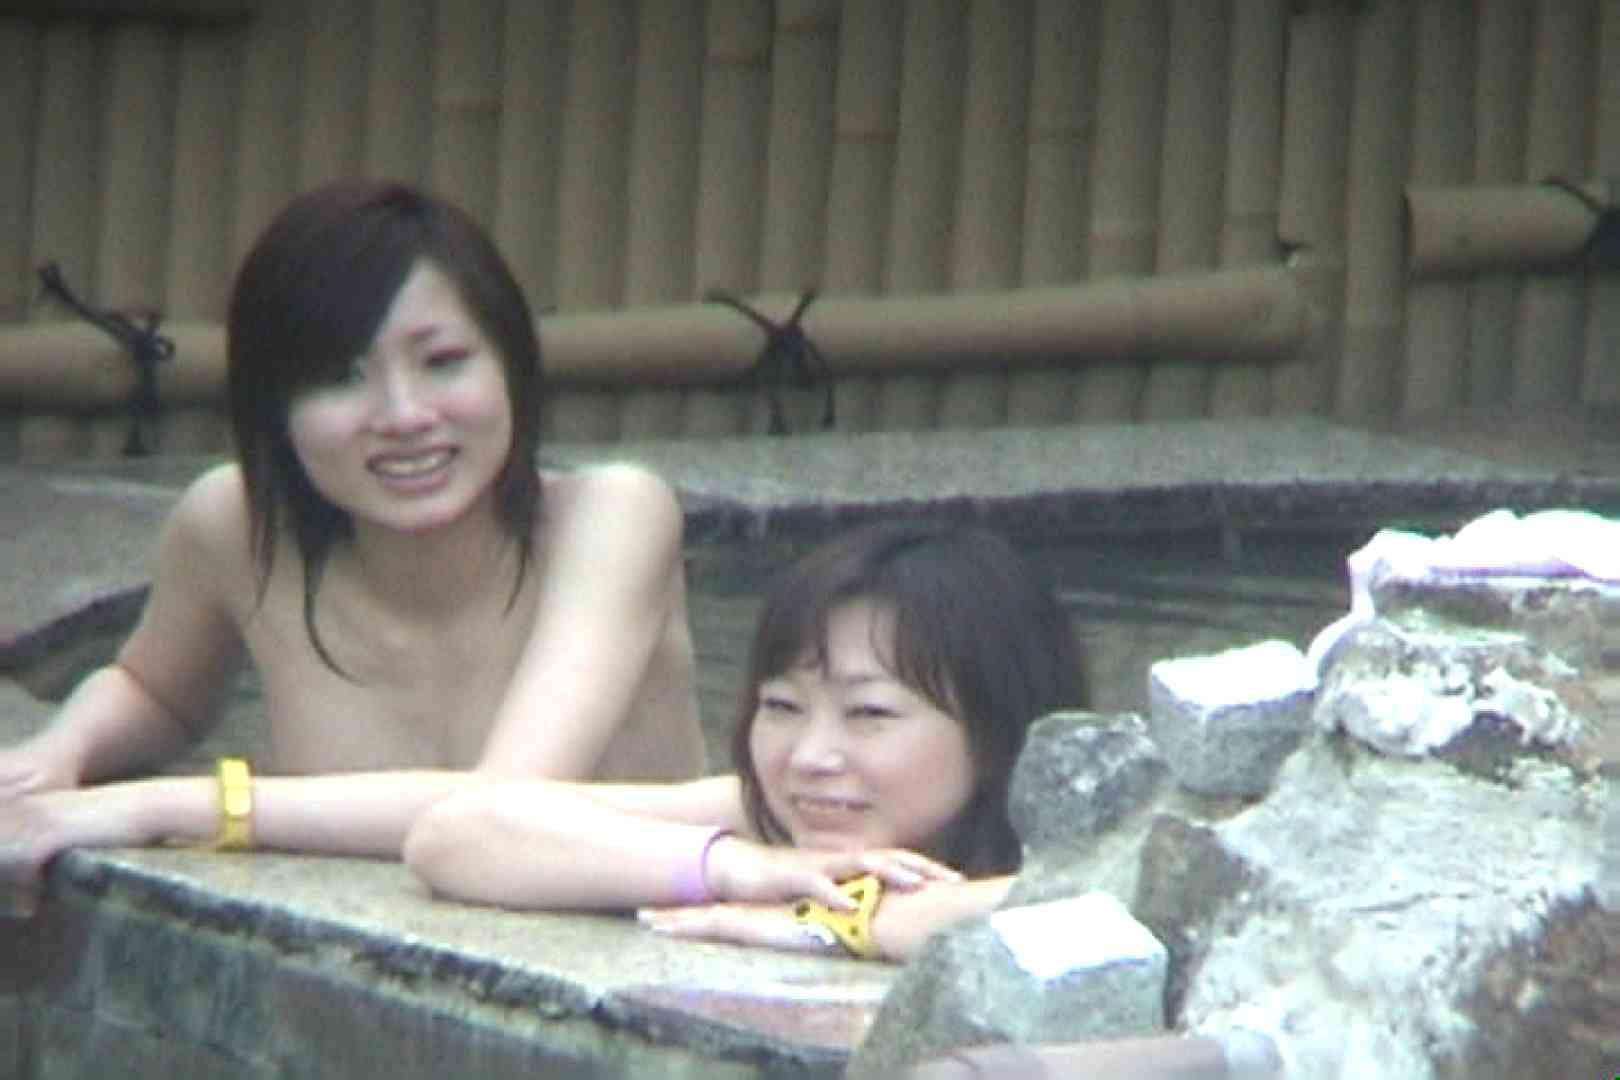 Aquaな露天風呂Vol.58【VIP限定】 HなOL | 0  95pic 53